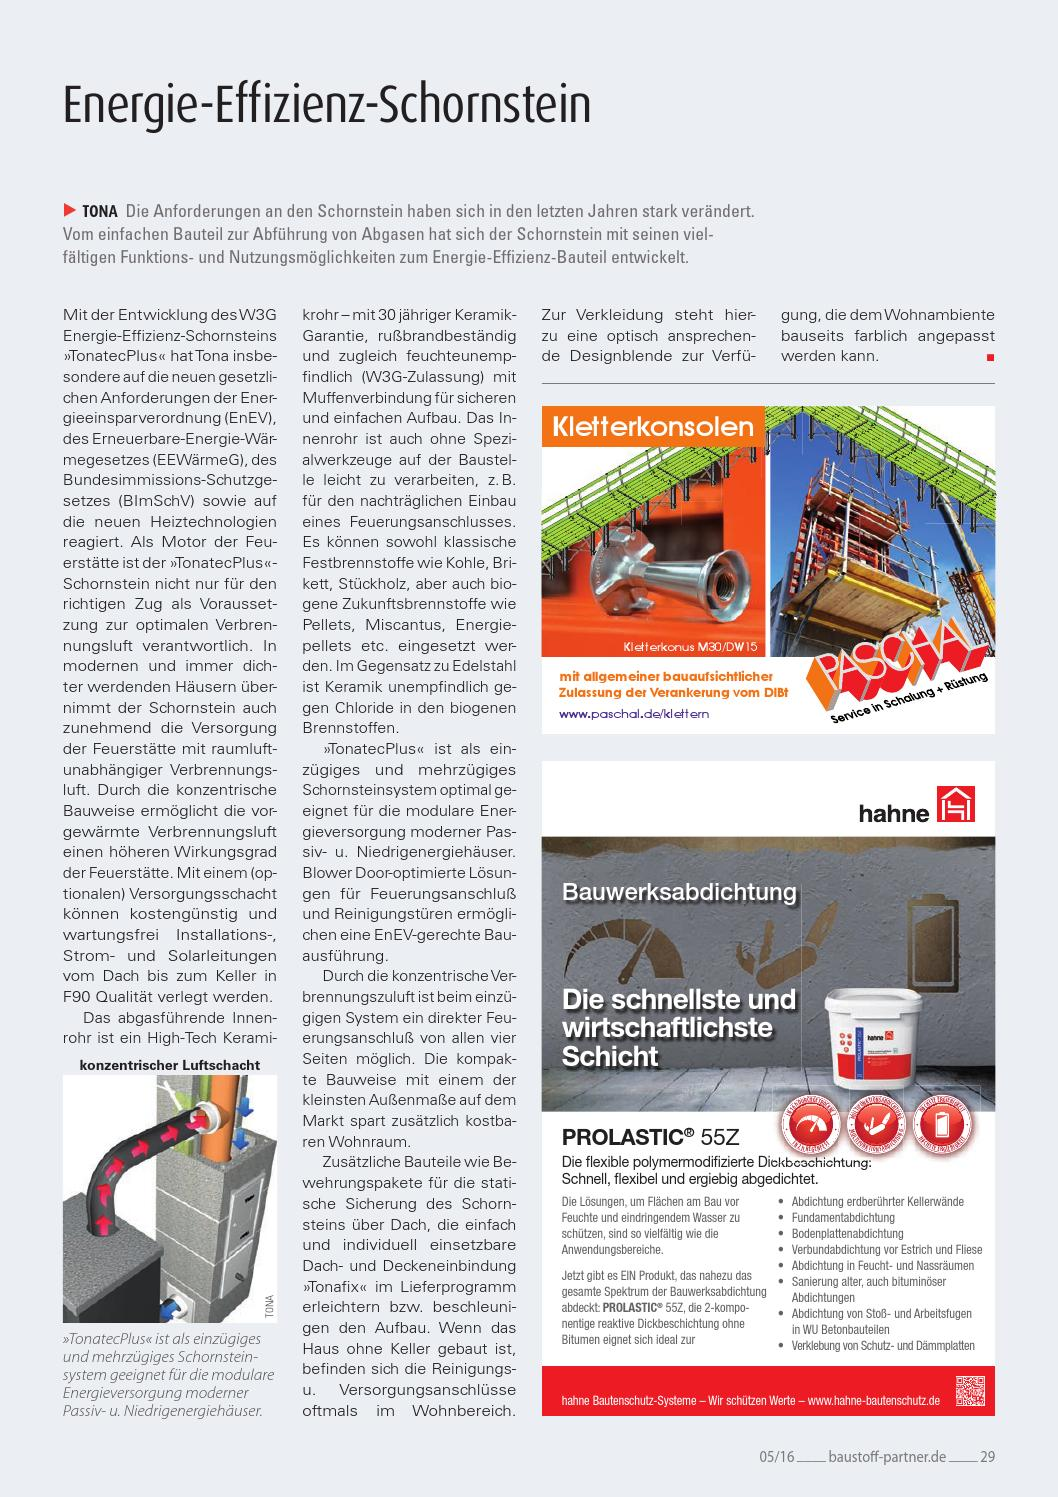 Baustoff-Partner Mai 2016 By Sbm Verlag Gmbh - Issuu